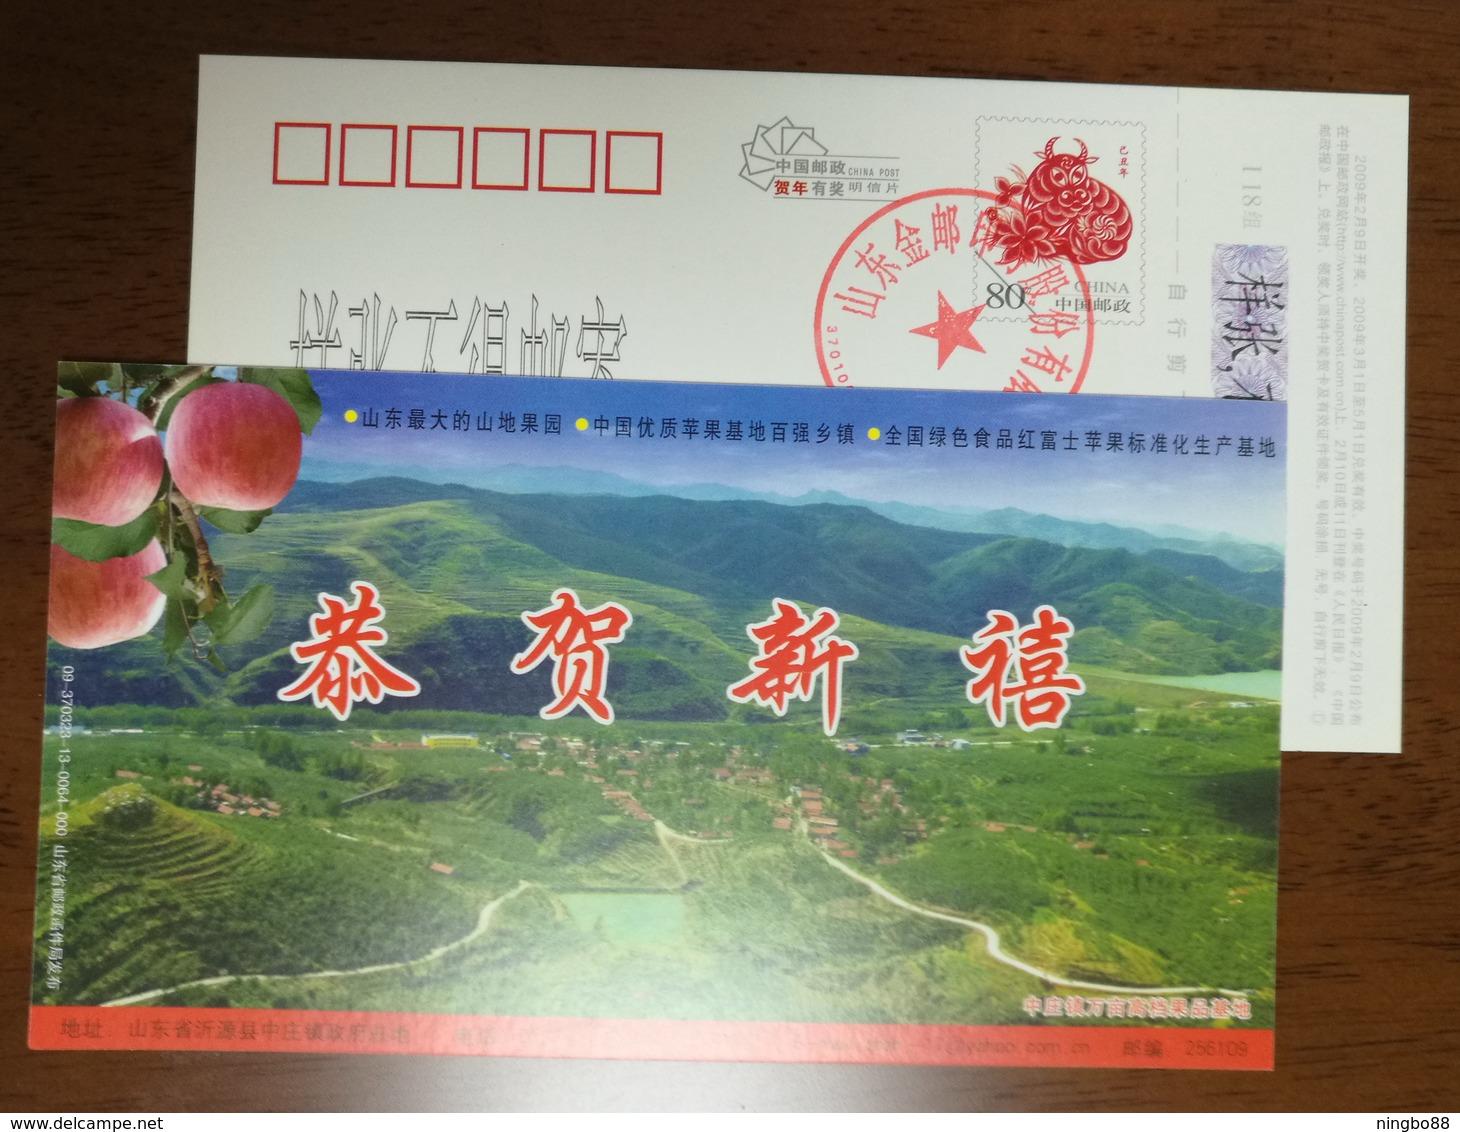 Red Fuji Apple,CN09 Zhongzhuang Town Ten Thousands Mu High Quality Fruit Base Pre-stamped Card,specimen Overprinted - Obst & Früchte